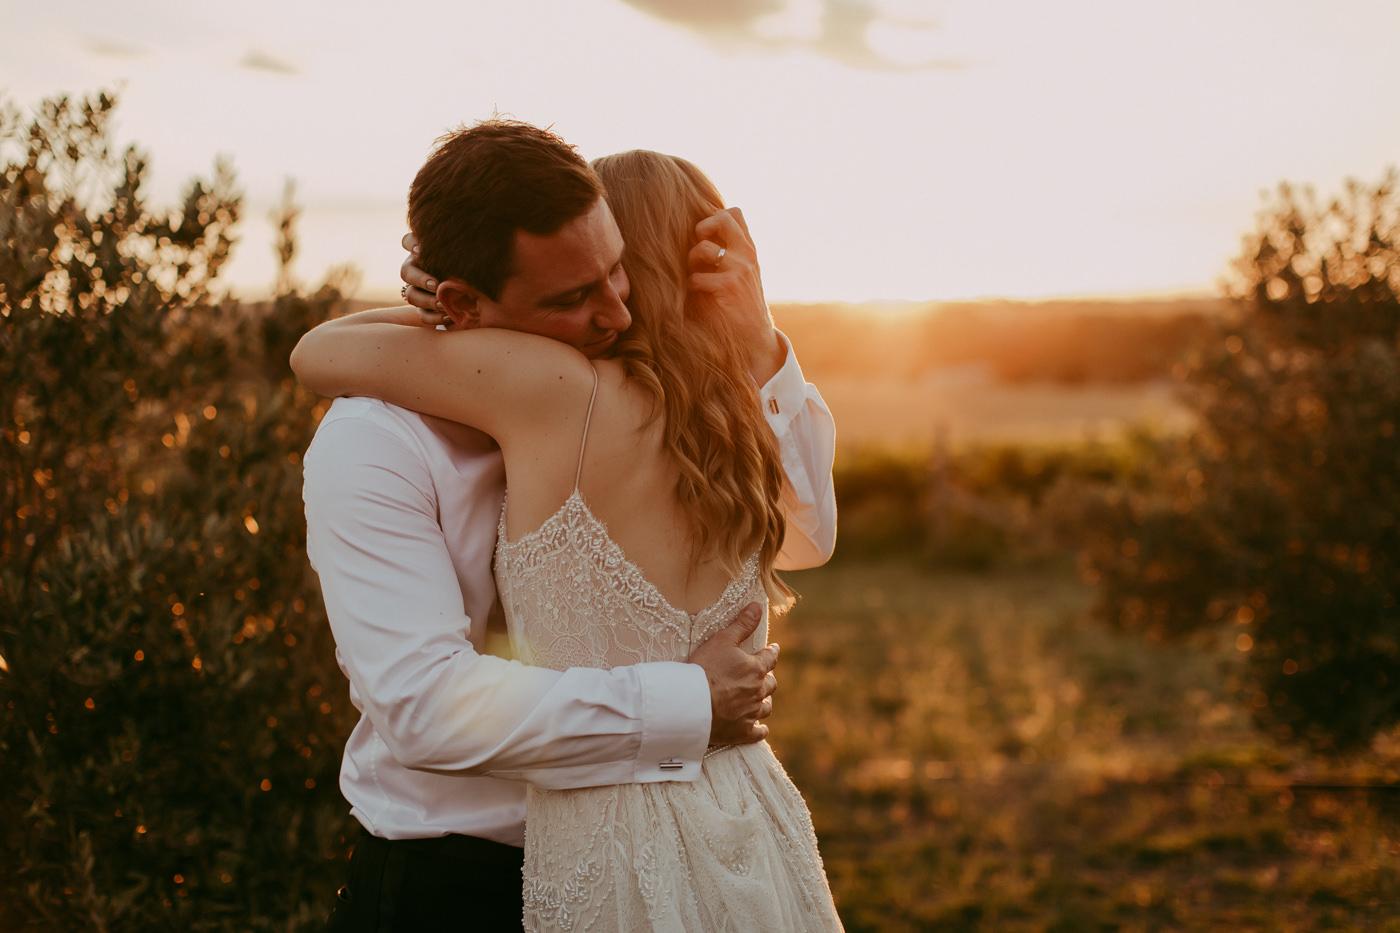 Anthony & Eliet - Wagga Wagga Wedding - Country NSW - Samantha Heather Photography-152.jpg